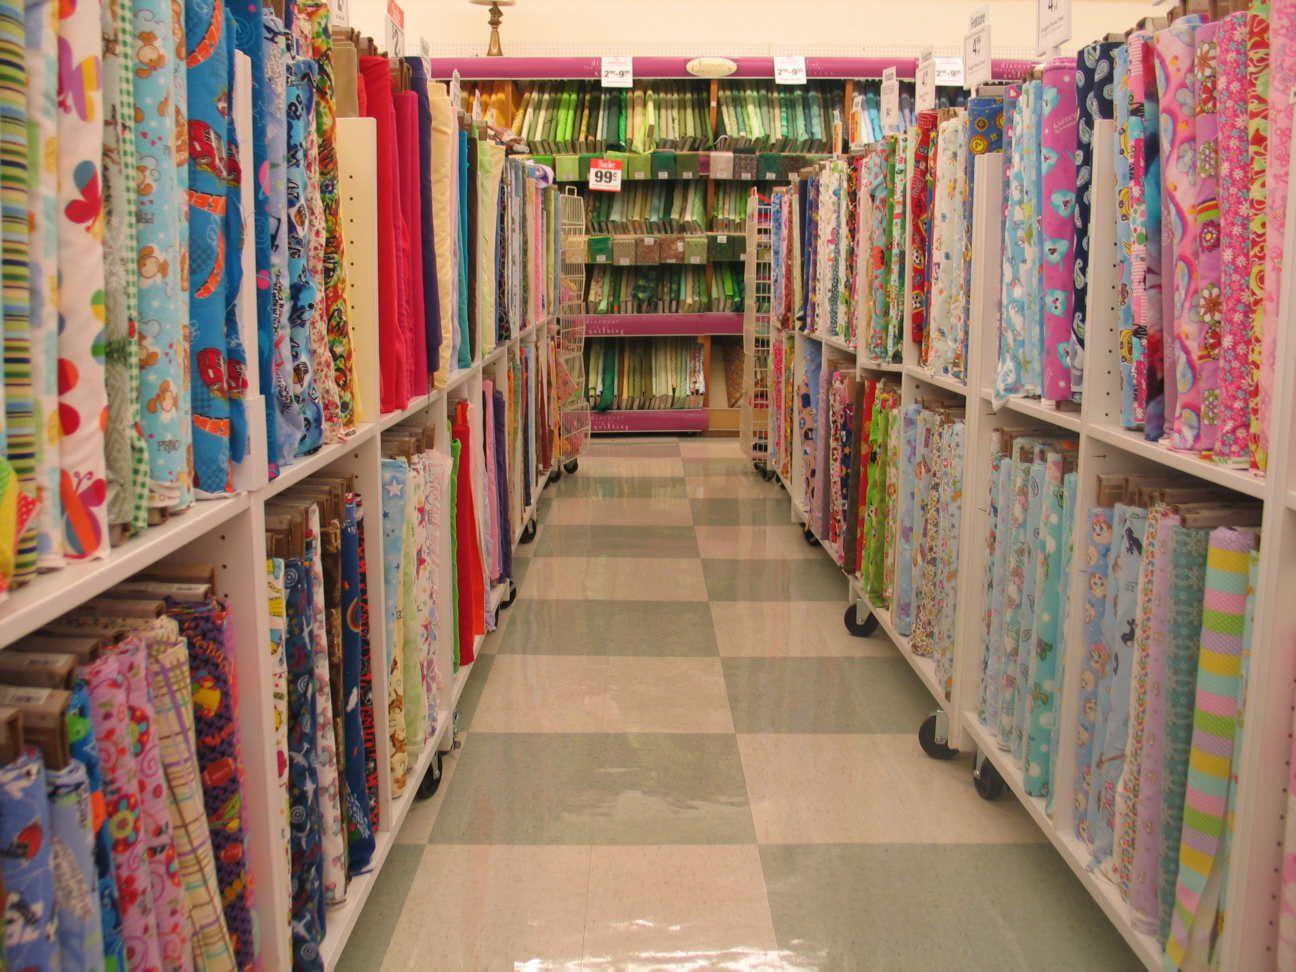 JOANN Fabrics and Crafts - 18 Reviews - Fabric Stores - 25 NE Lp ...